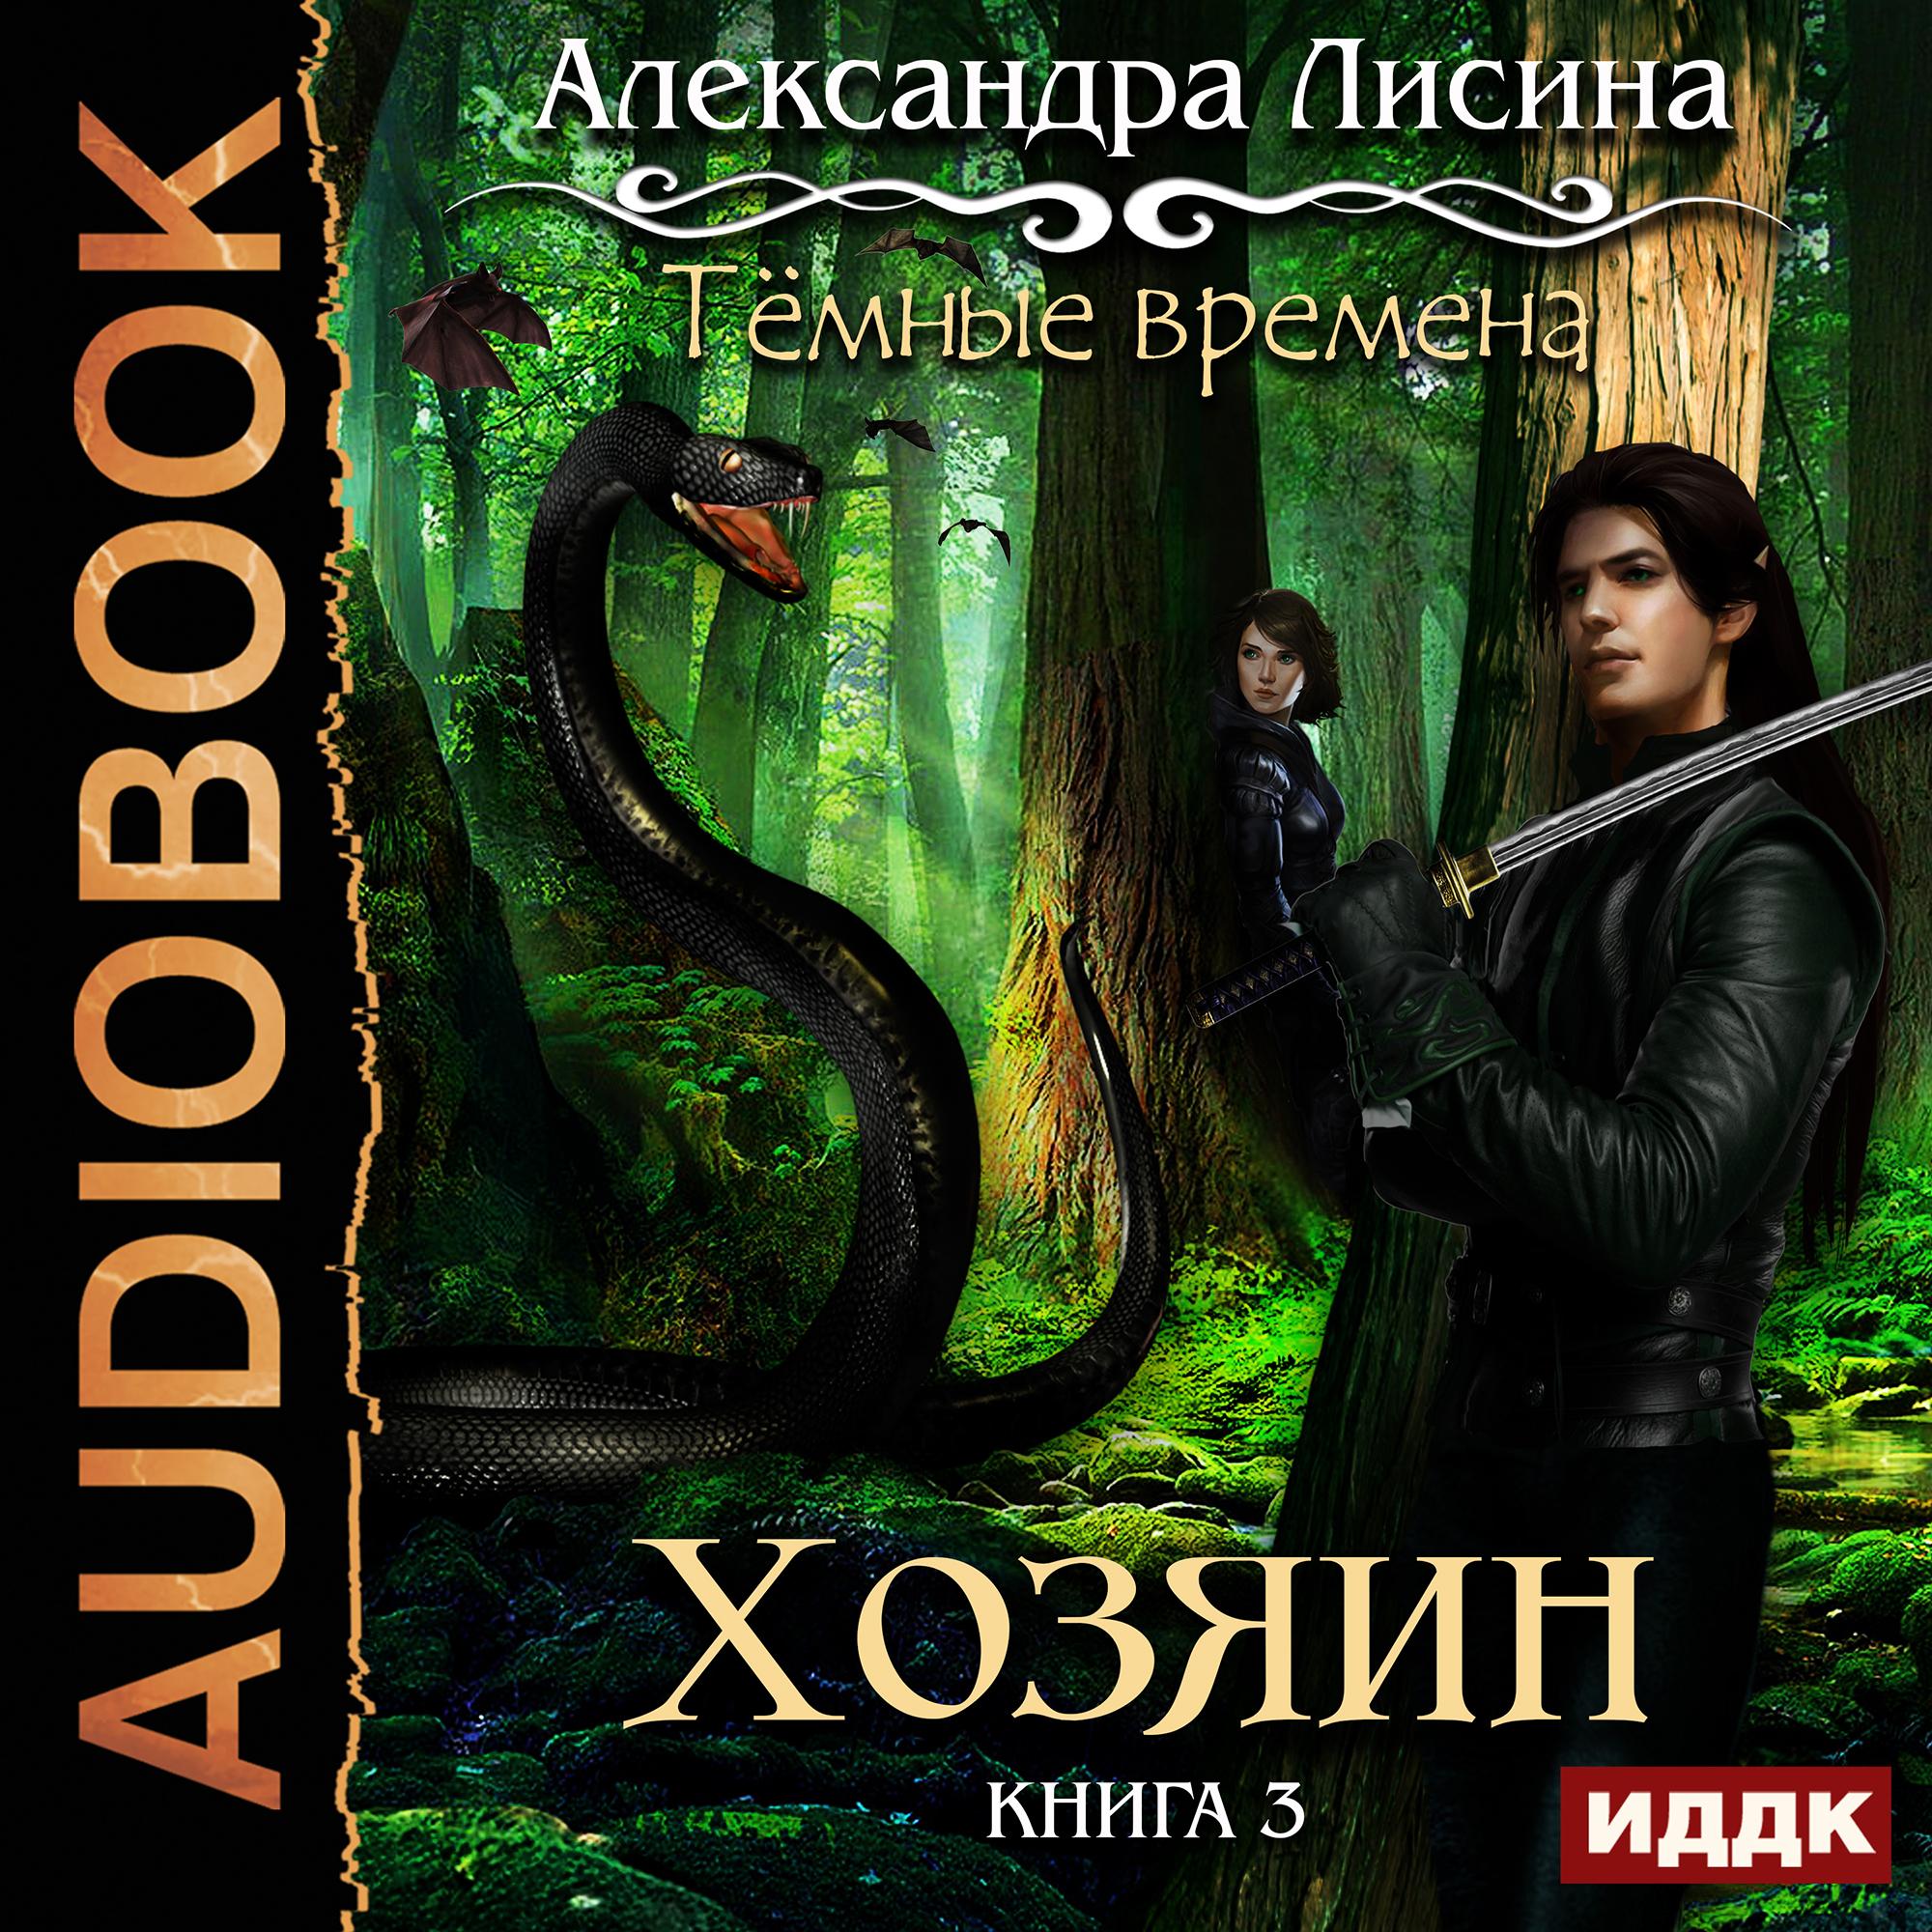 Лисина Александра Темные времена: Хозяин. Книга 3 (цифровая версия) (Цифровая версия)